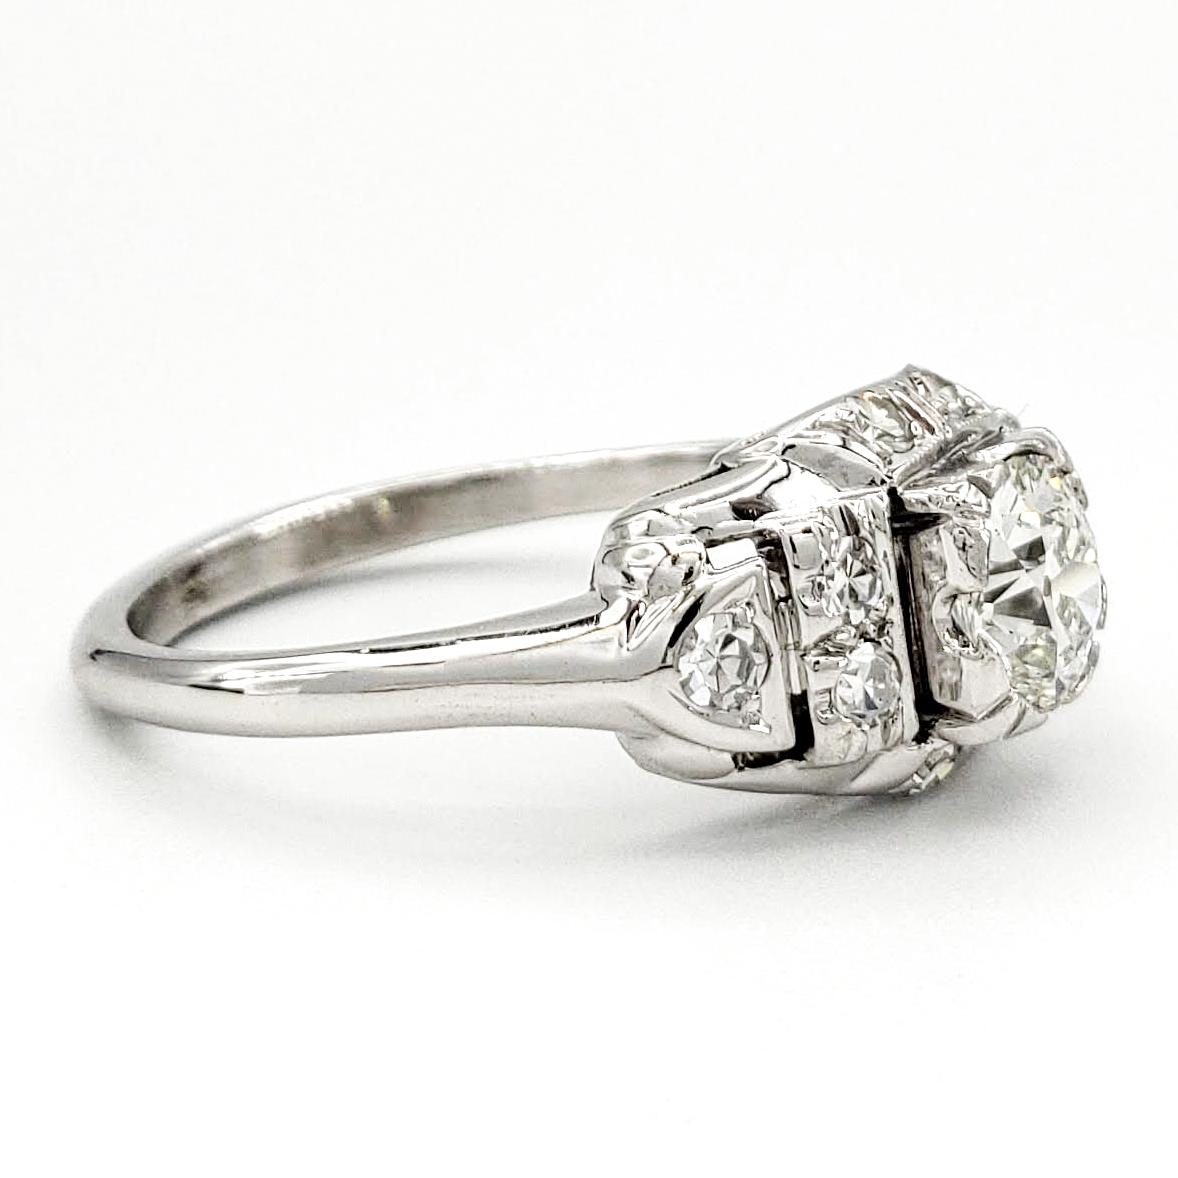 vintage-14-karat-gold-engagement-ring-with-0-55-carat-old-european-cut-diamond-egl-h-vs1